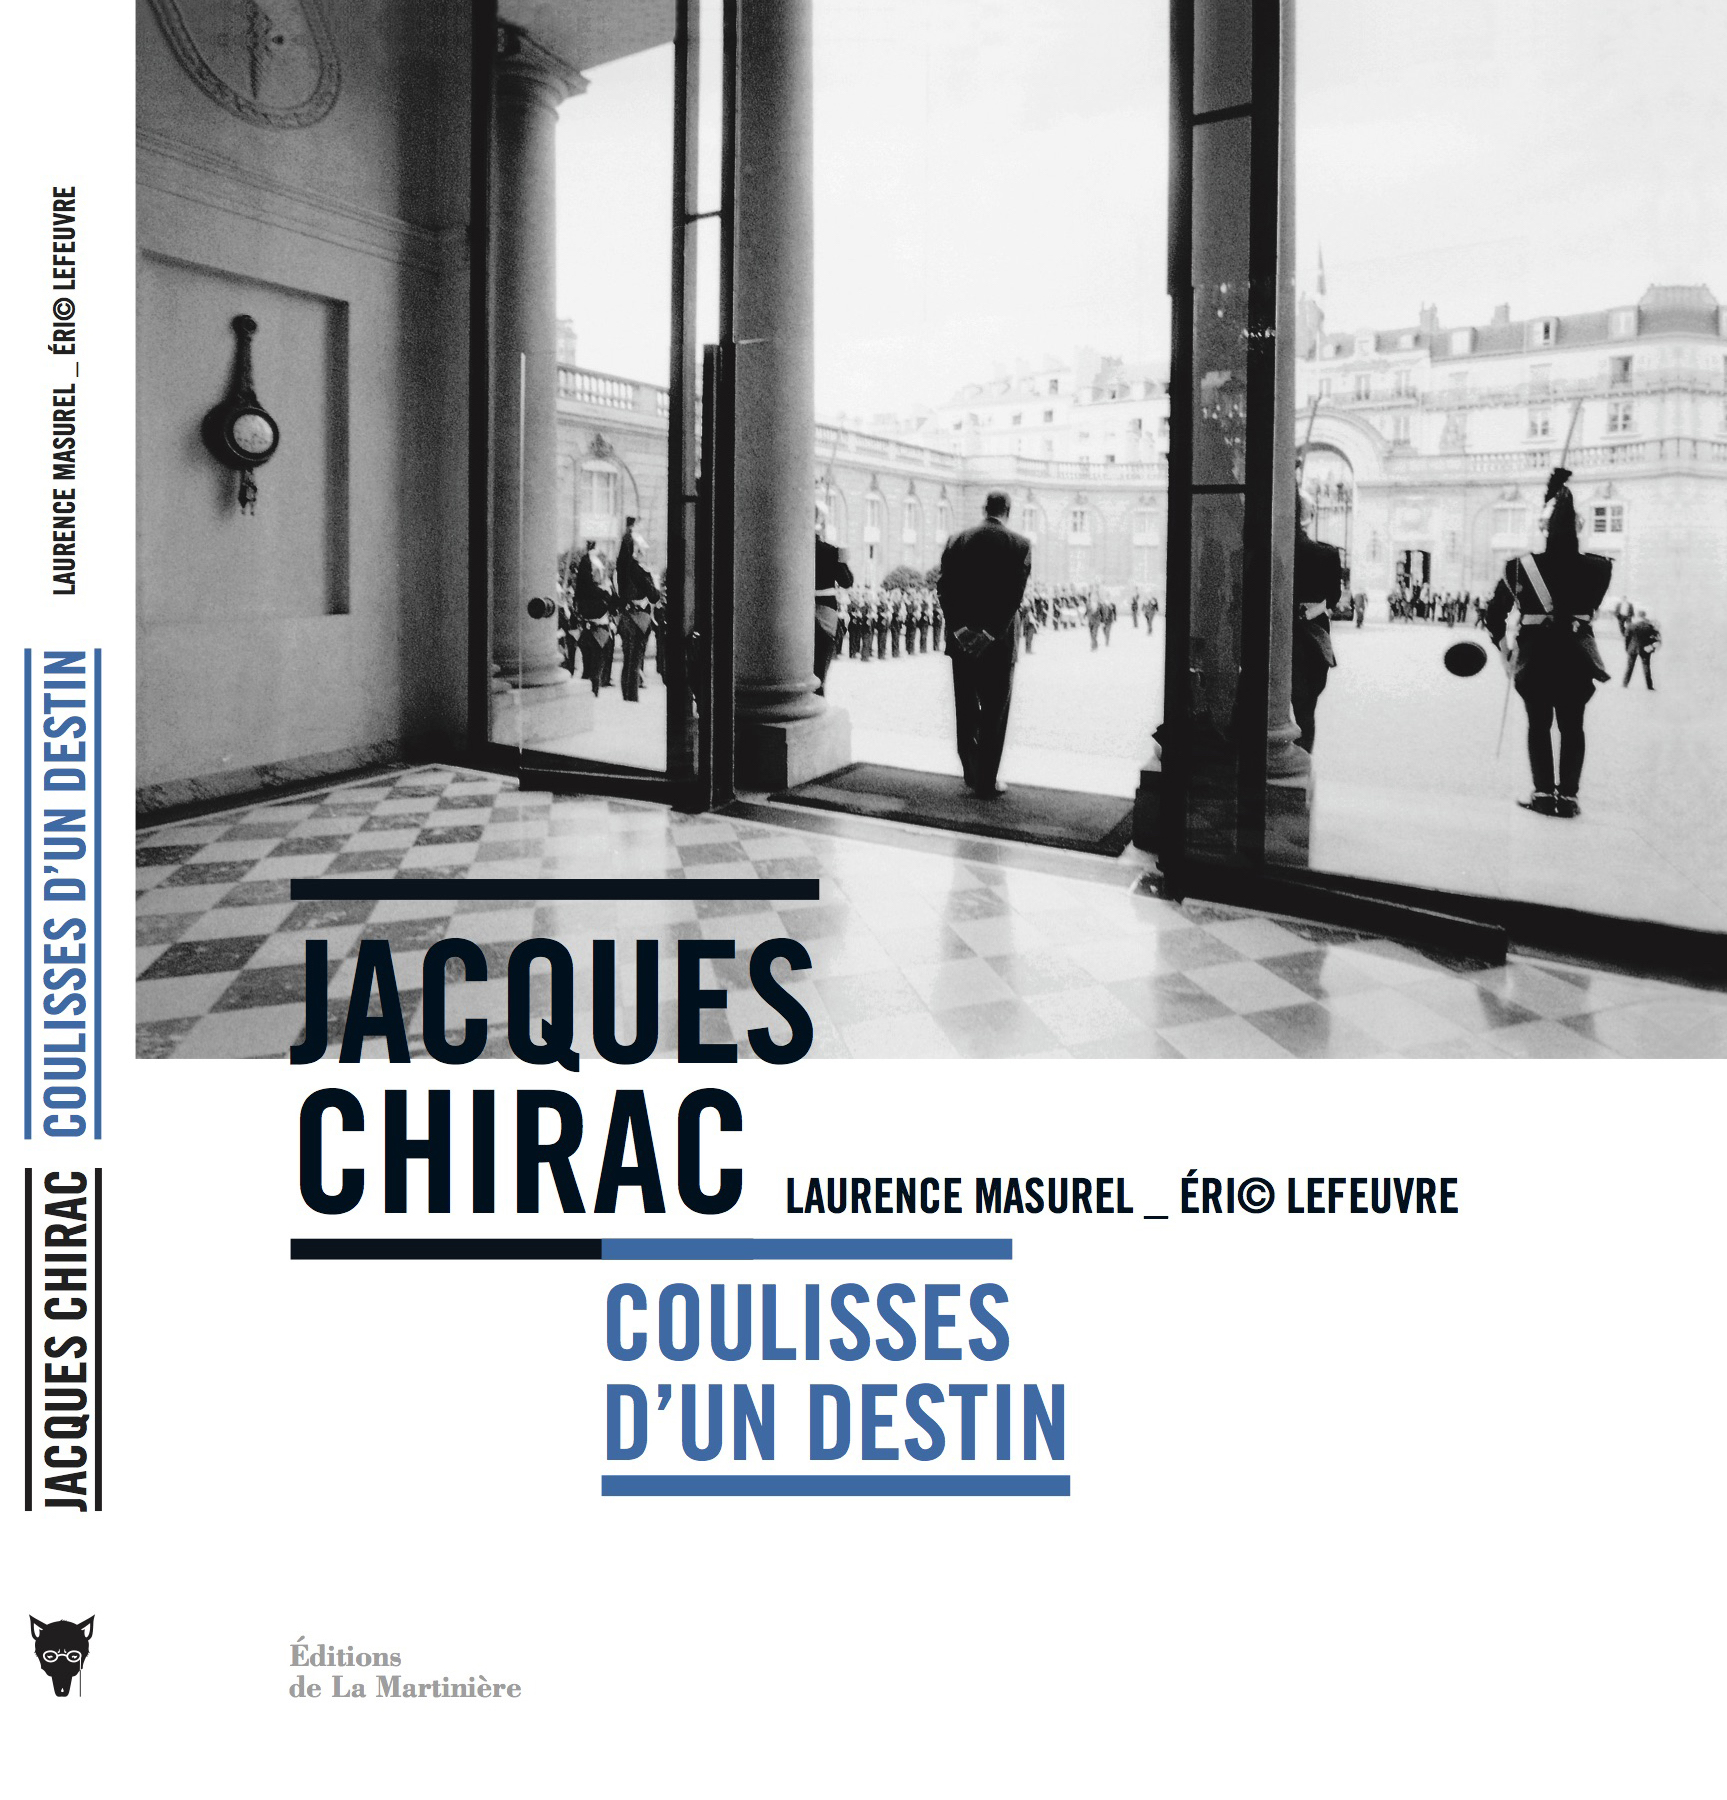 COUV_JacquesChirac_EDLM_HD